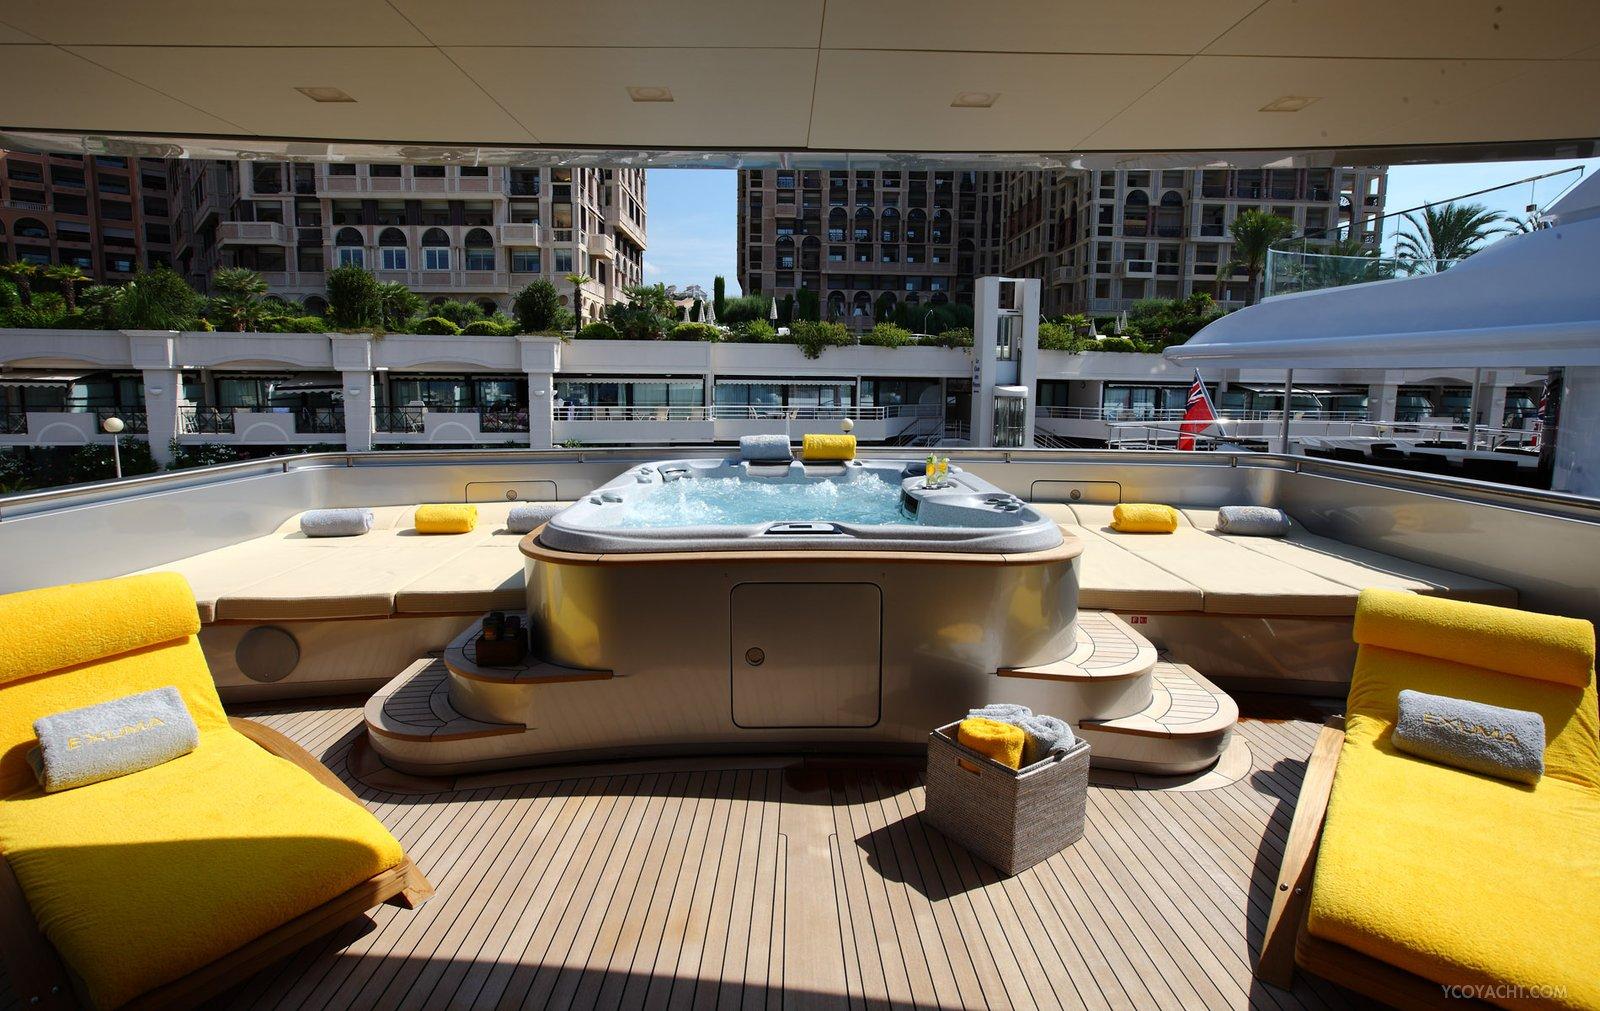 The Saint Tropez House Guide to: The Monaco Grand Prix 2015